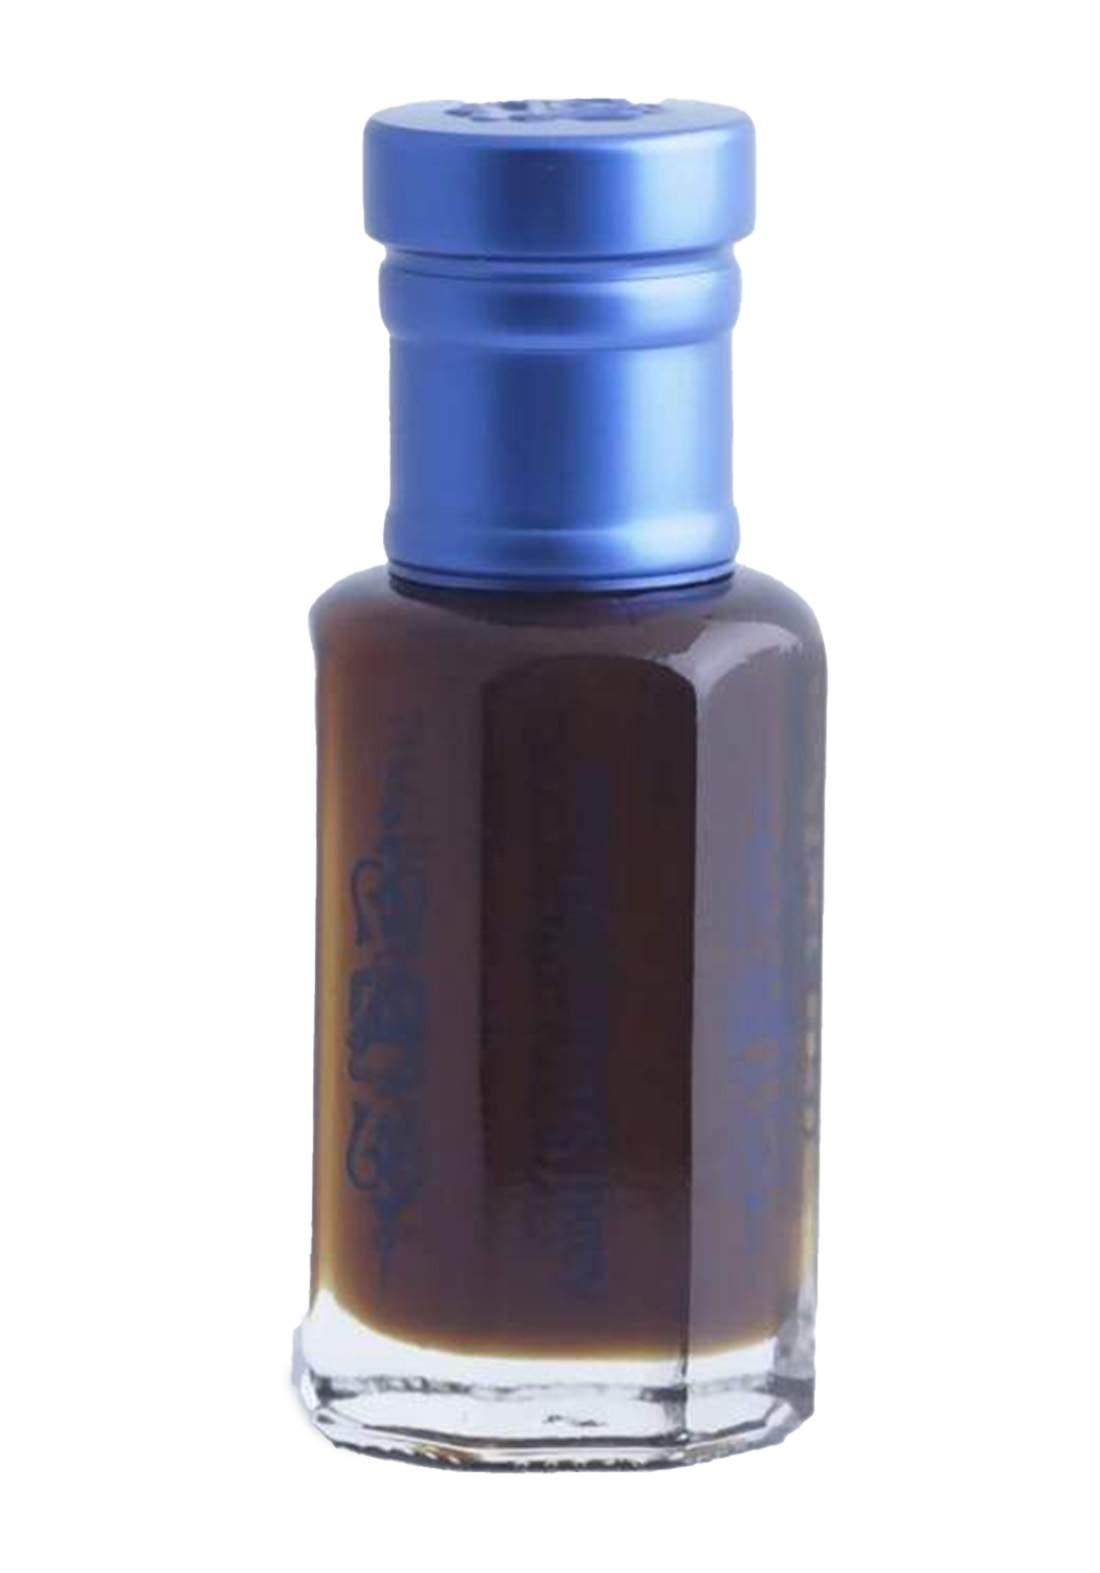 Abdul Samad Al Qurashi 21018 Fragrant Aoud Oil 12g عطر زيتي